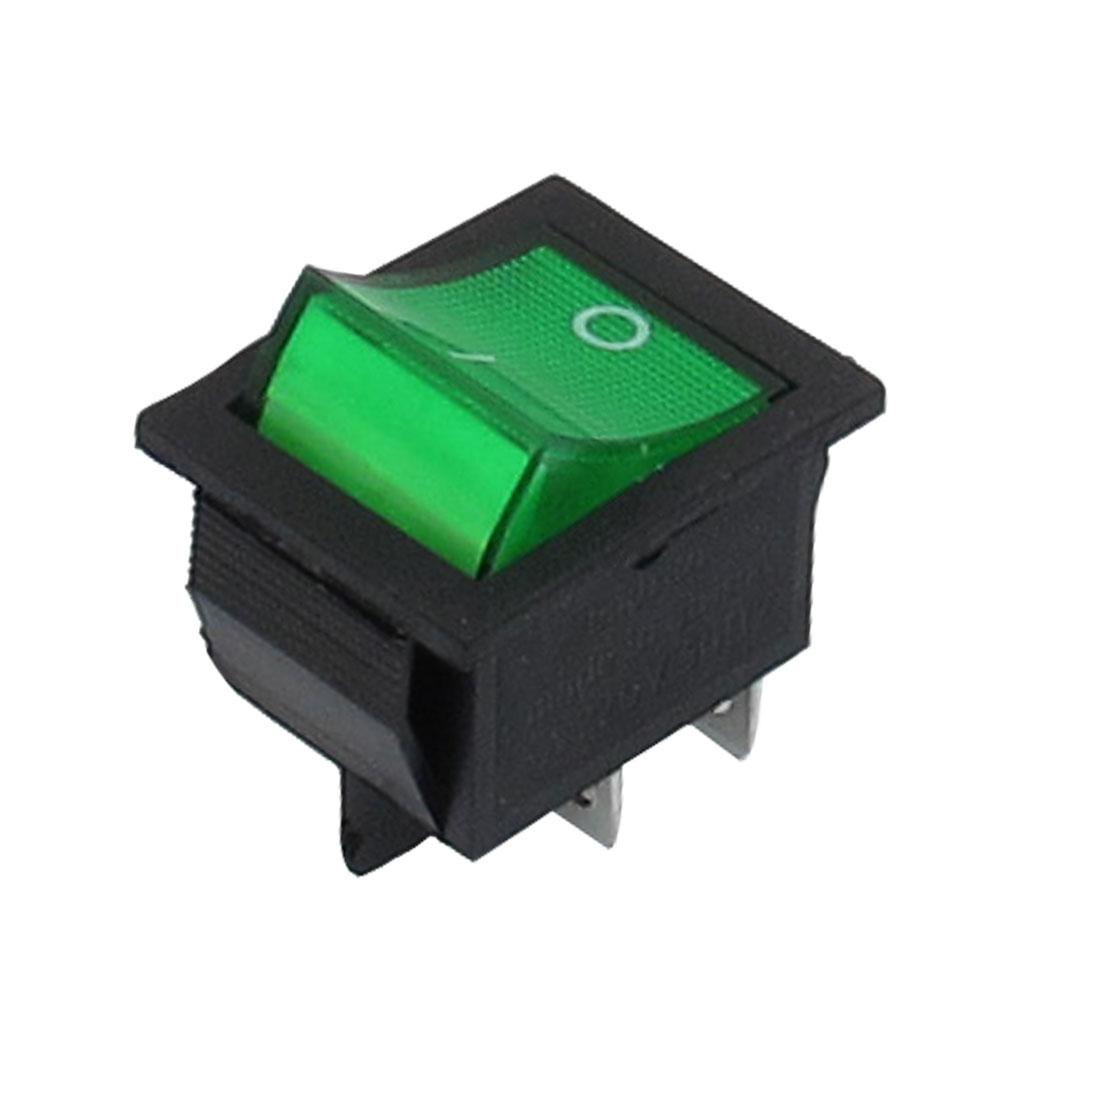 Green Illuminated Light On/Off DPST Boat Rocker Switch 5A 220V AC